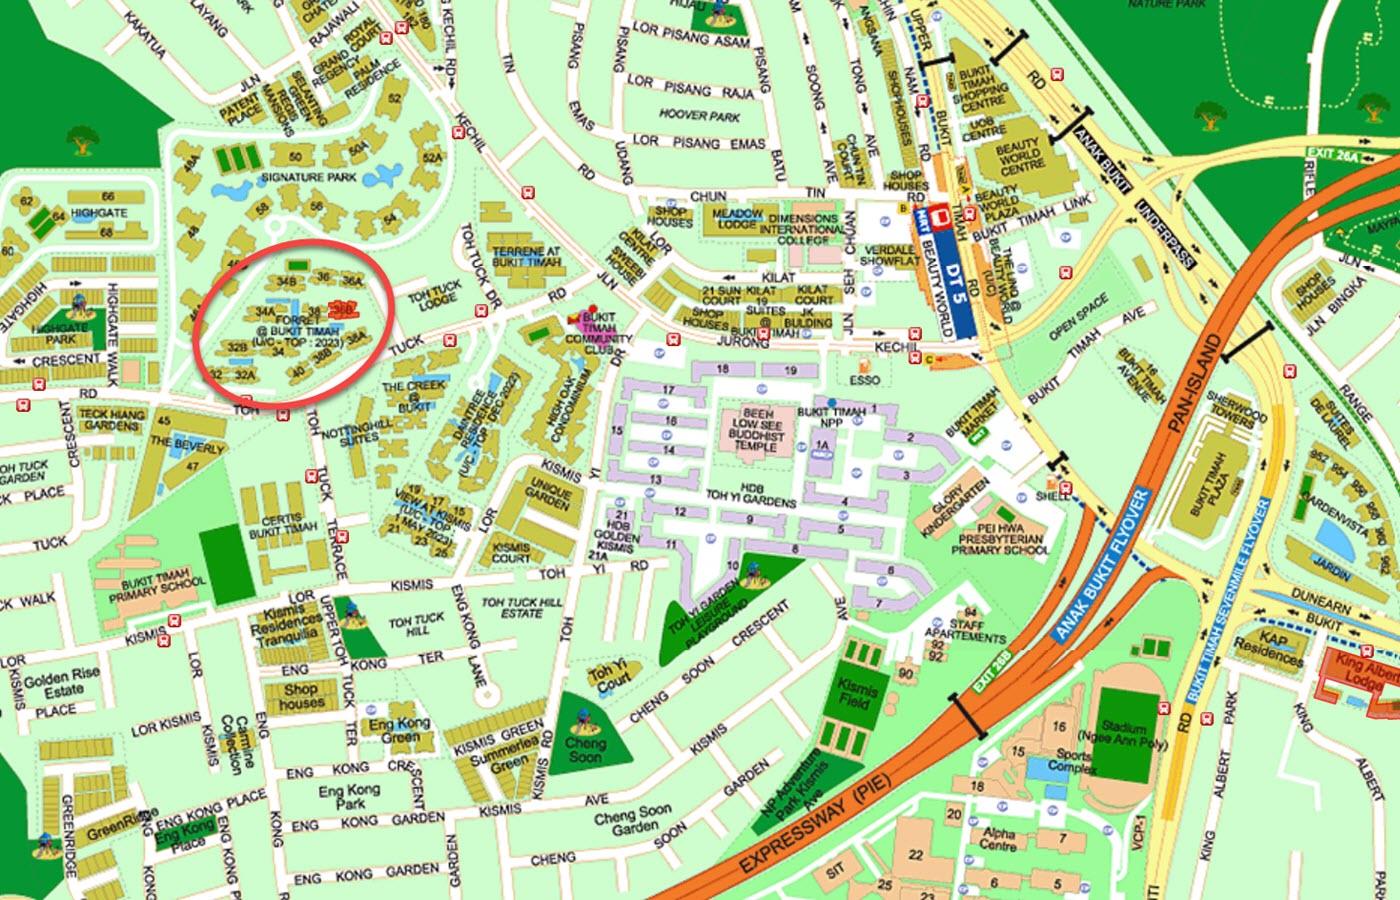 Forett At Bukit Timah Condo Location - Street Directory Map